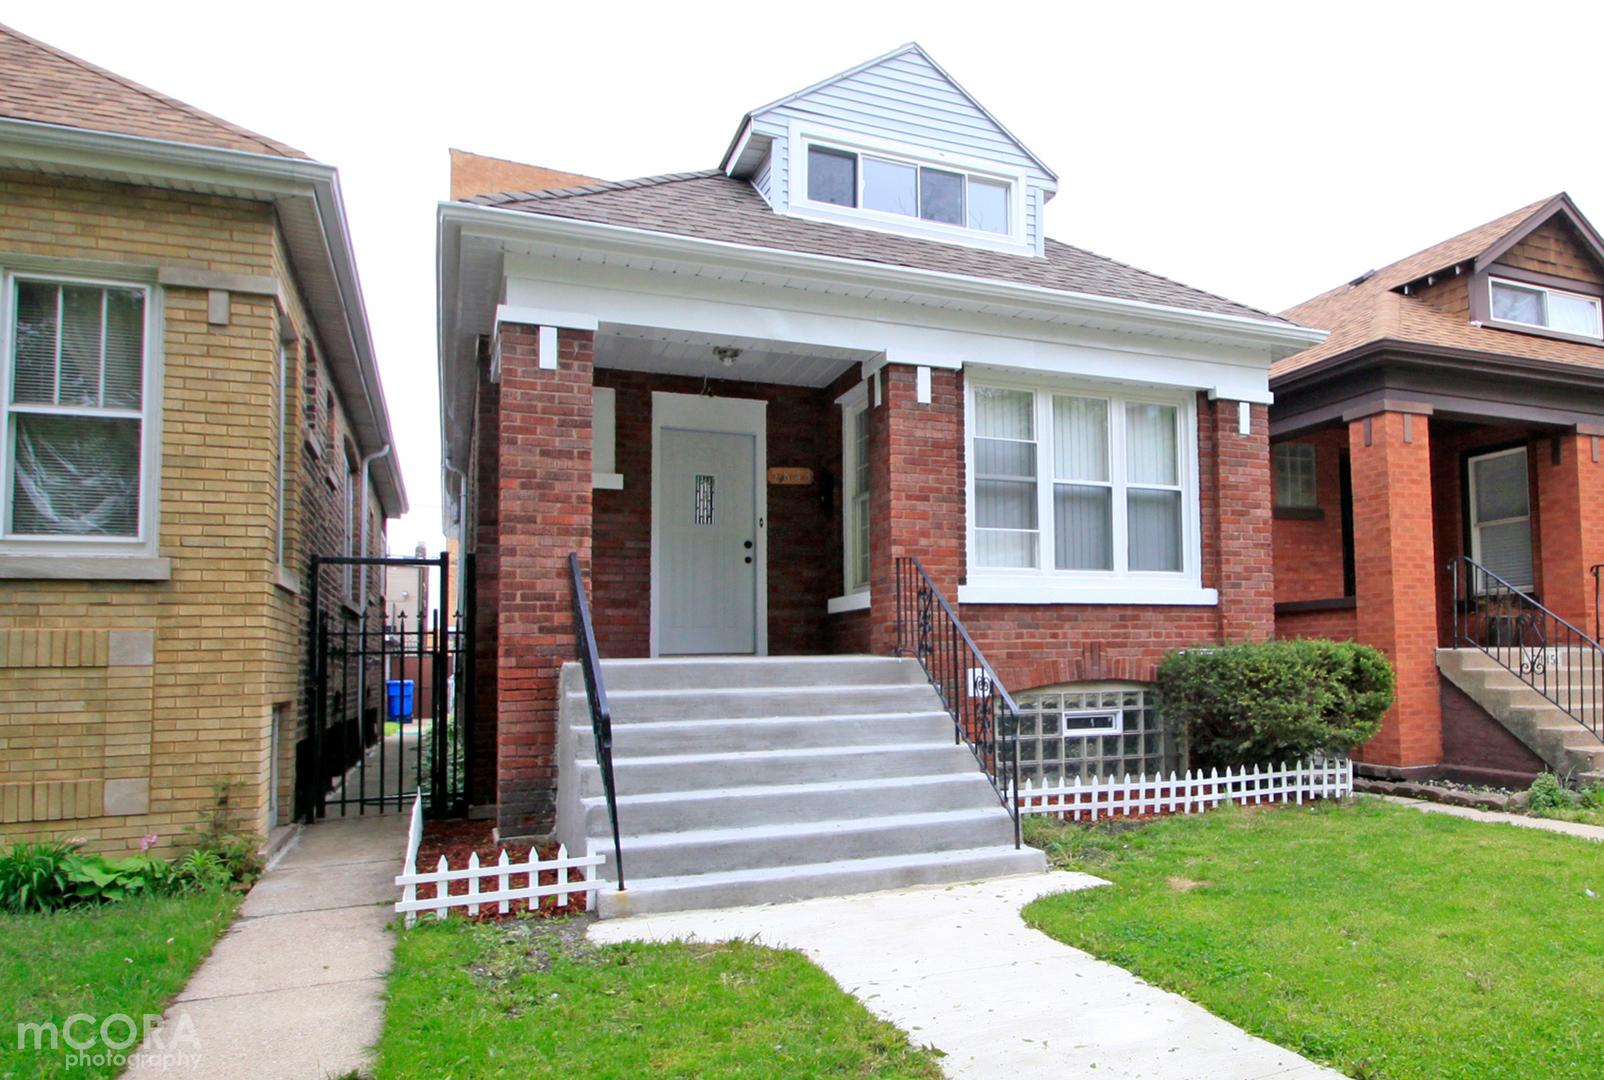 5843 SOUTH SAWYER AVENUE, CHICAGO, IL 60629